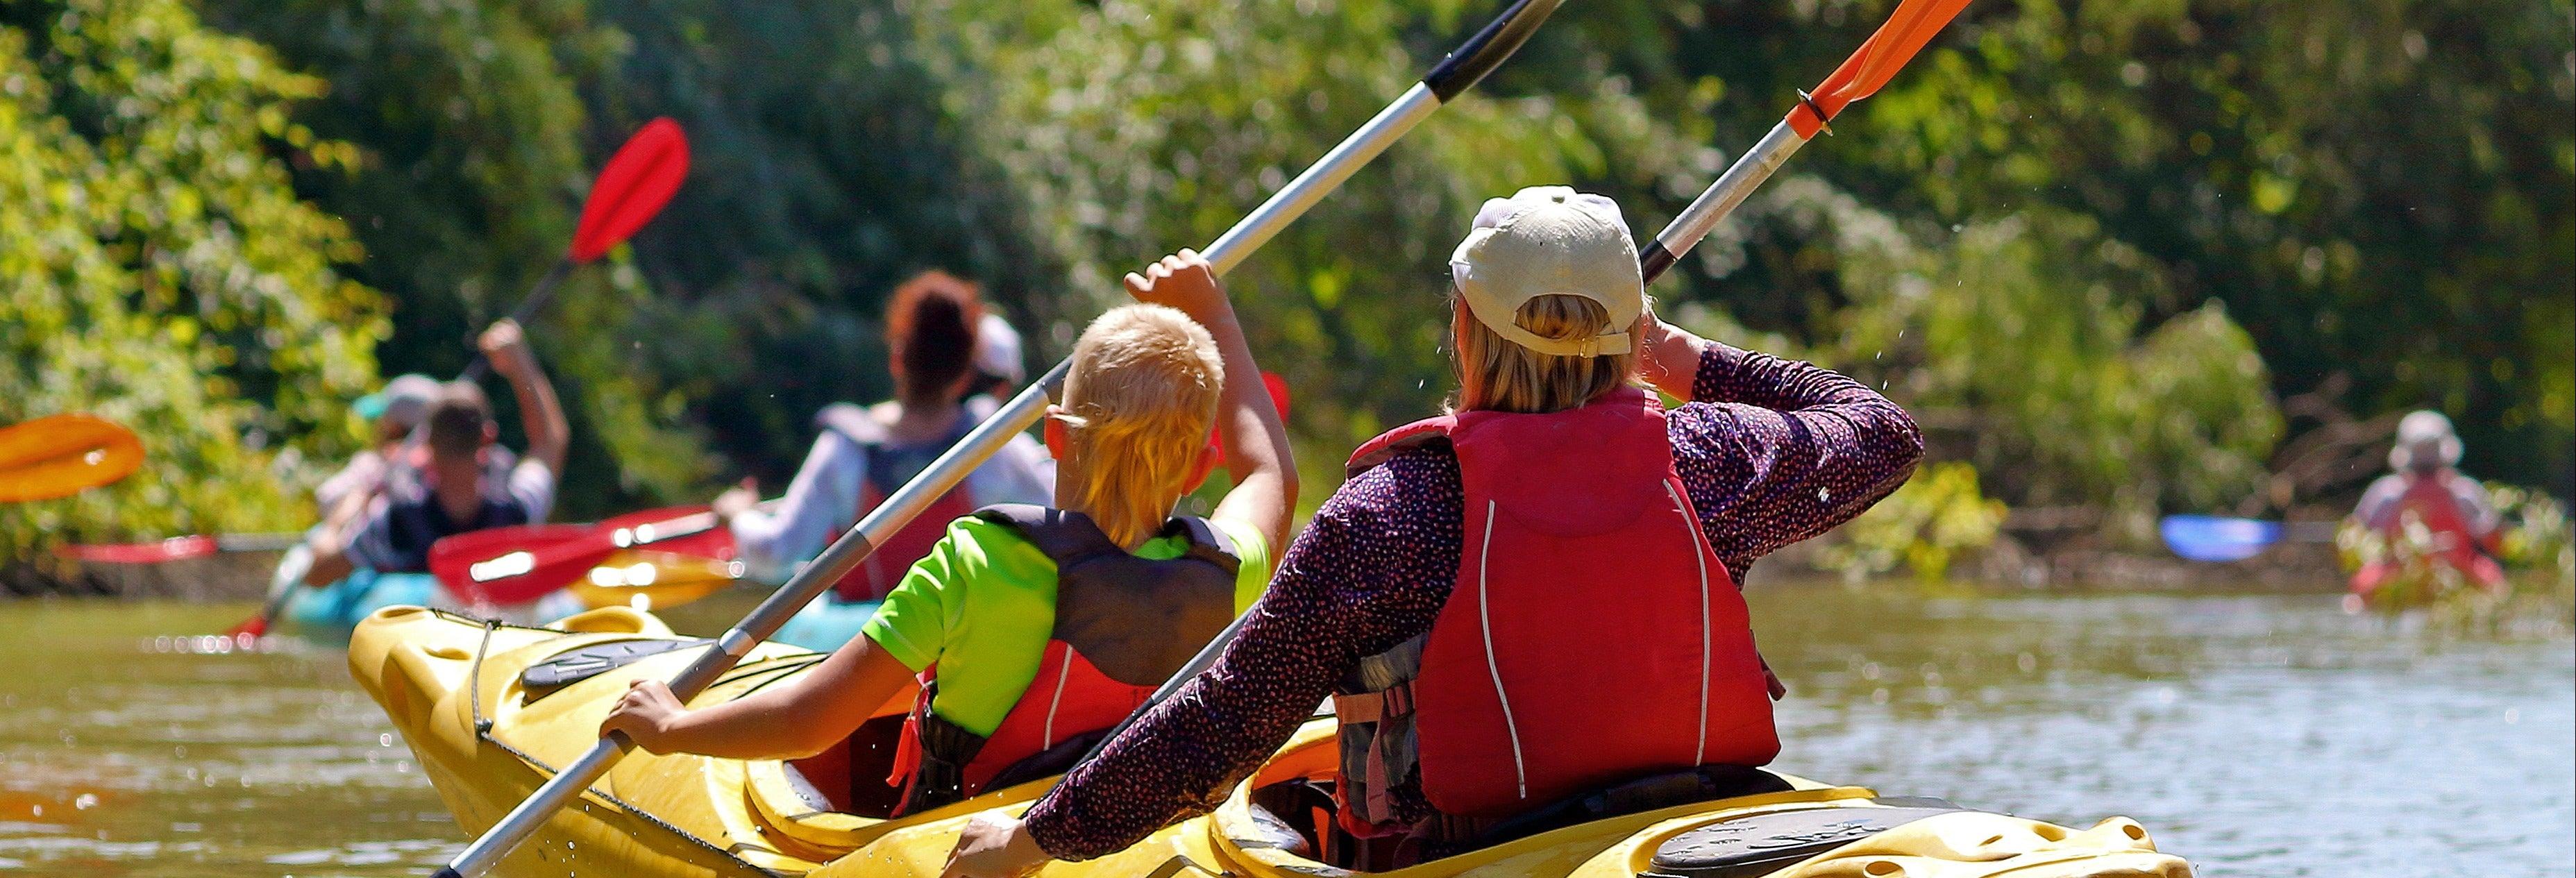 Balade en kayak sur la mer Adriatique et la rivière Žrnovnica